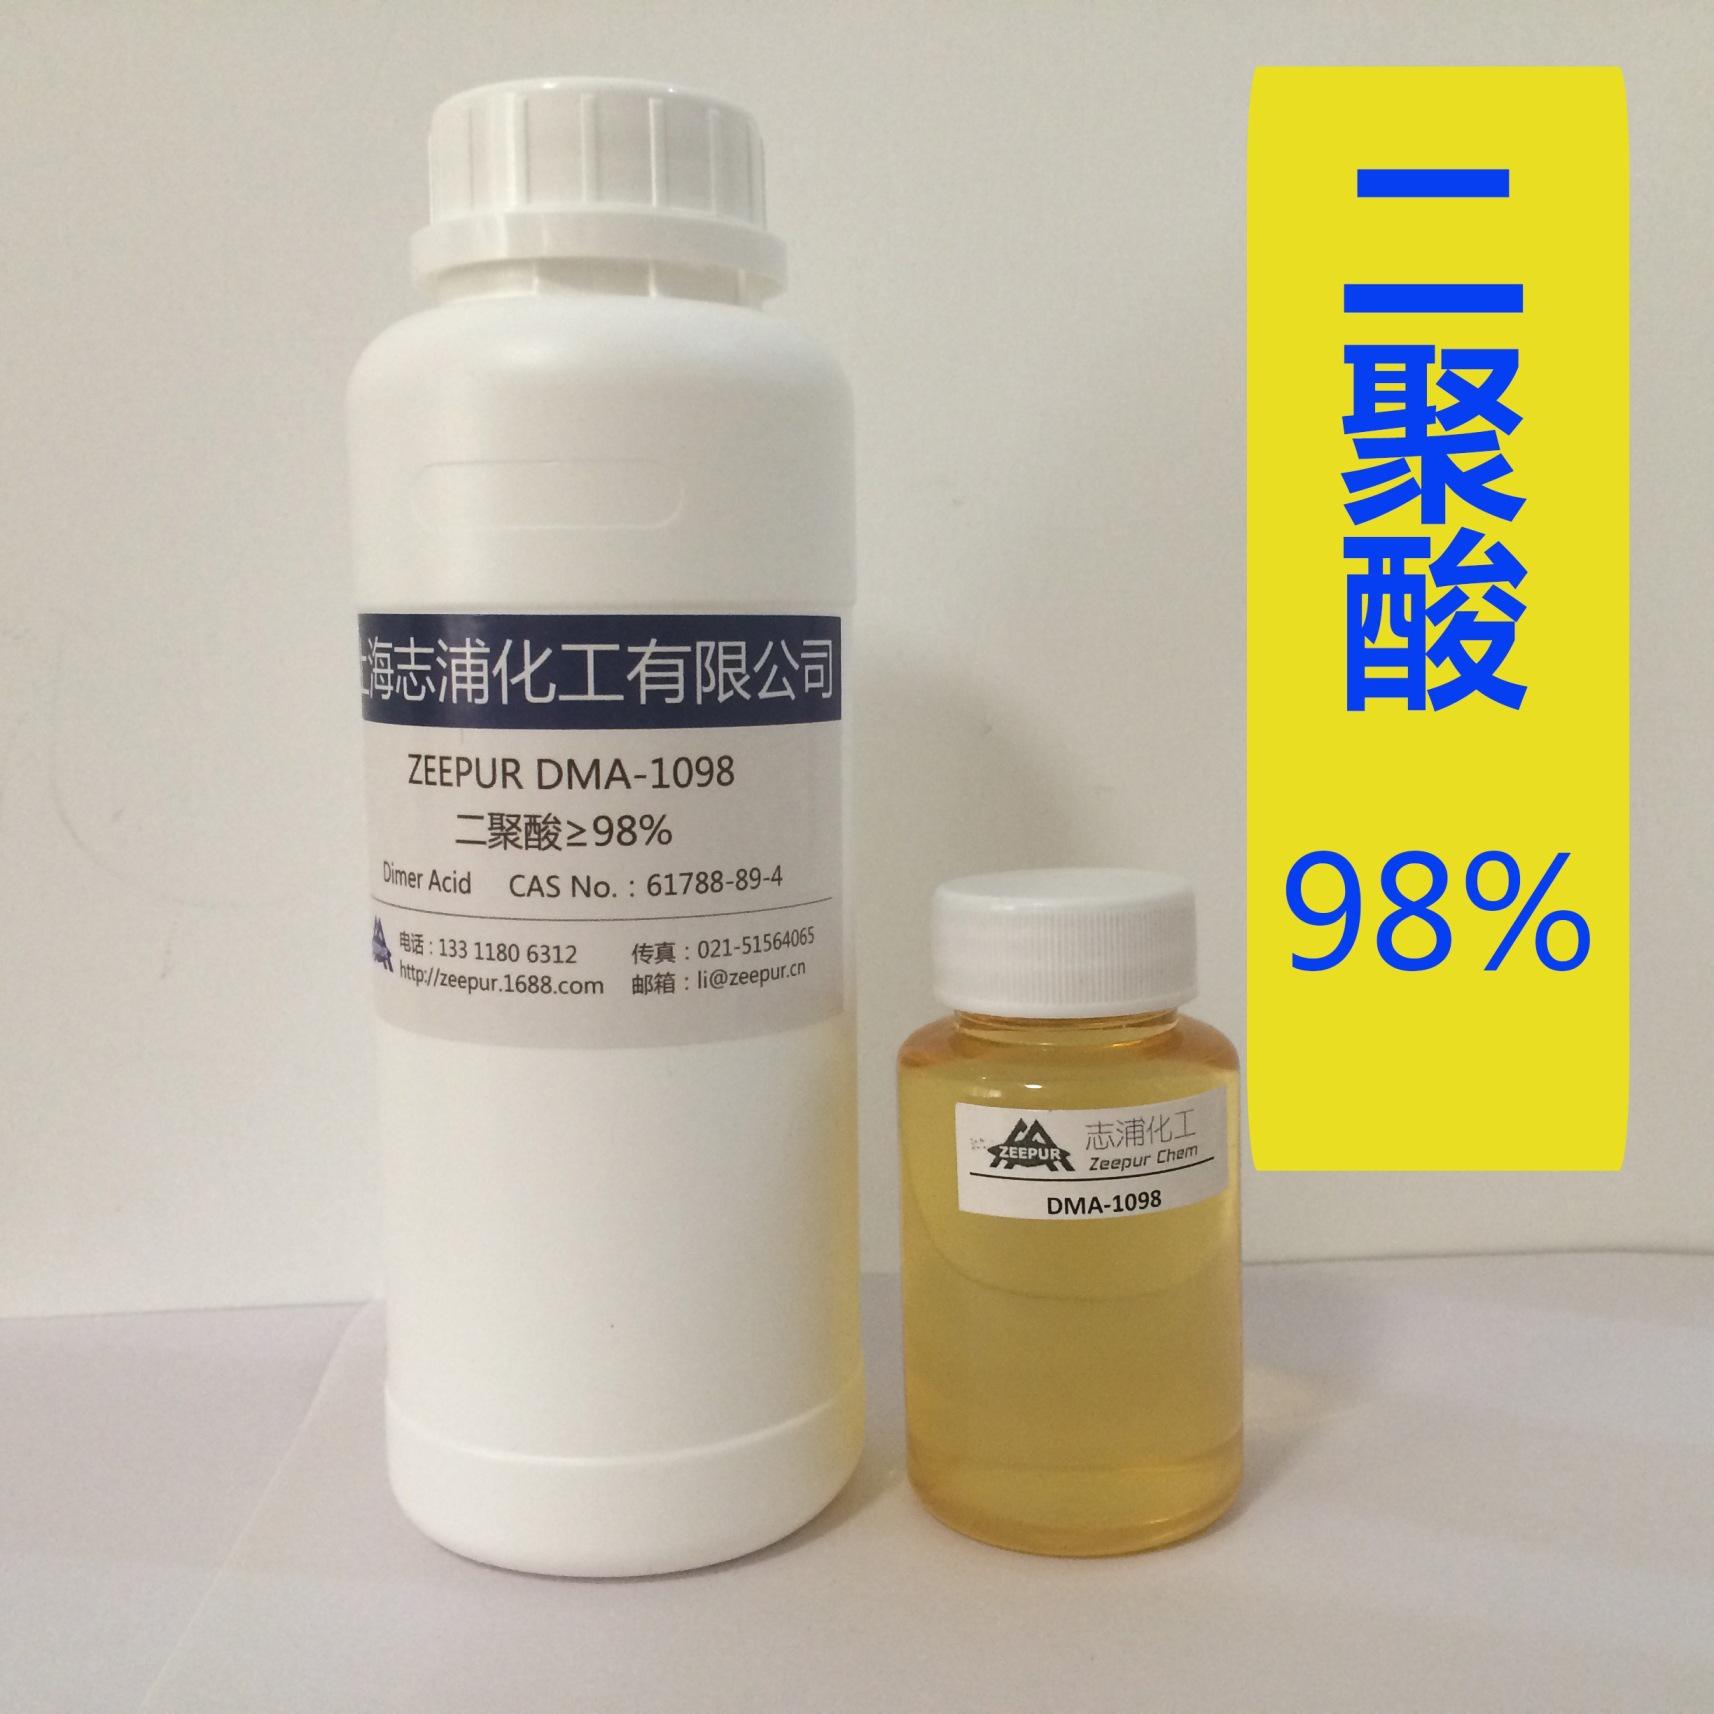 ZEEPUR DMA-1098 axit Dimer (mẫu 500 g)